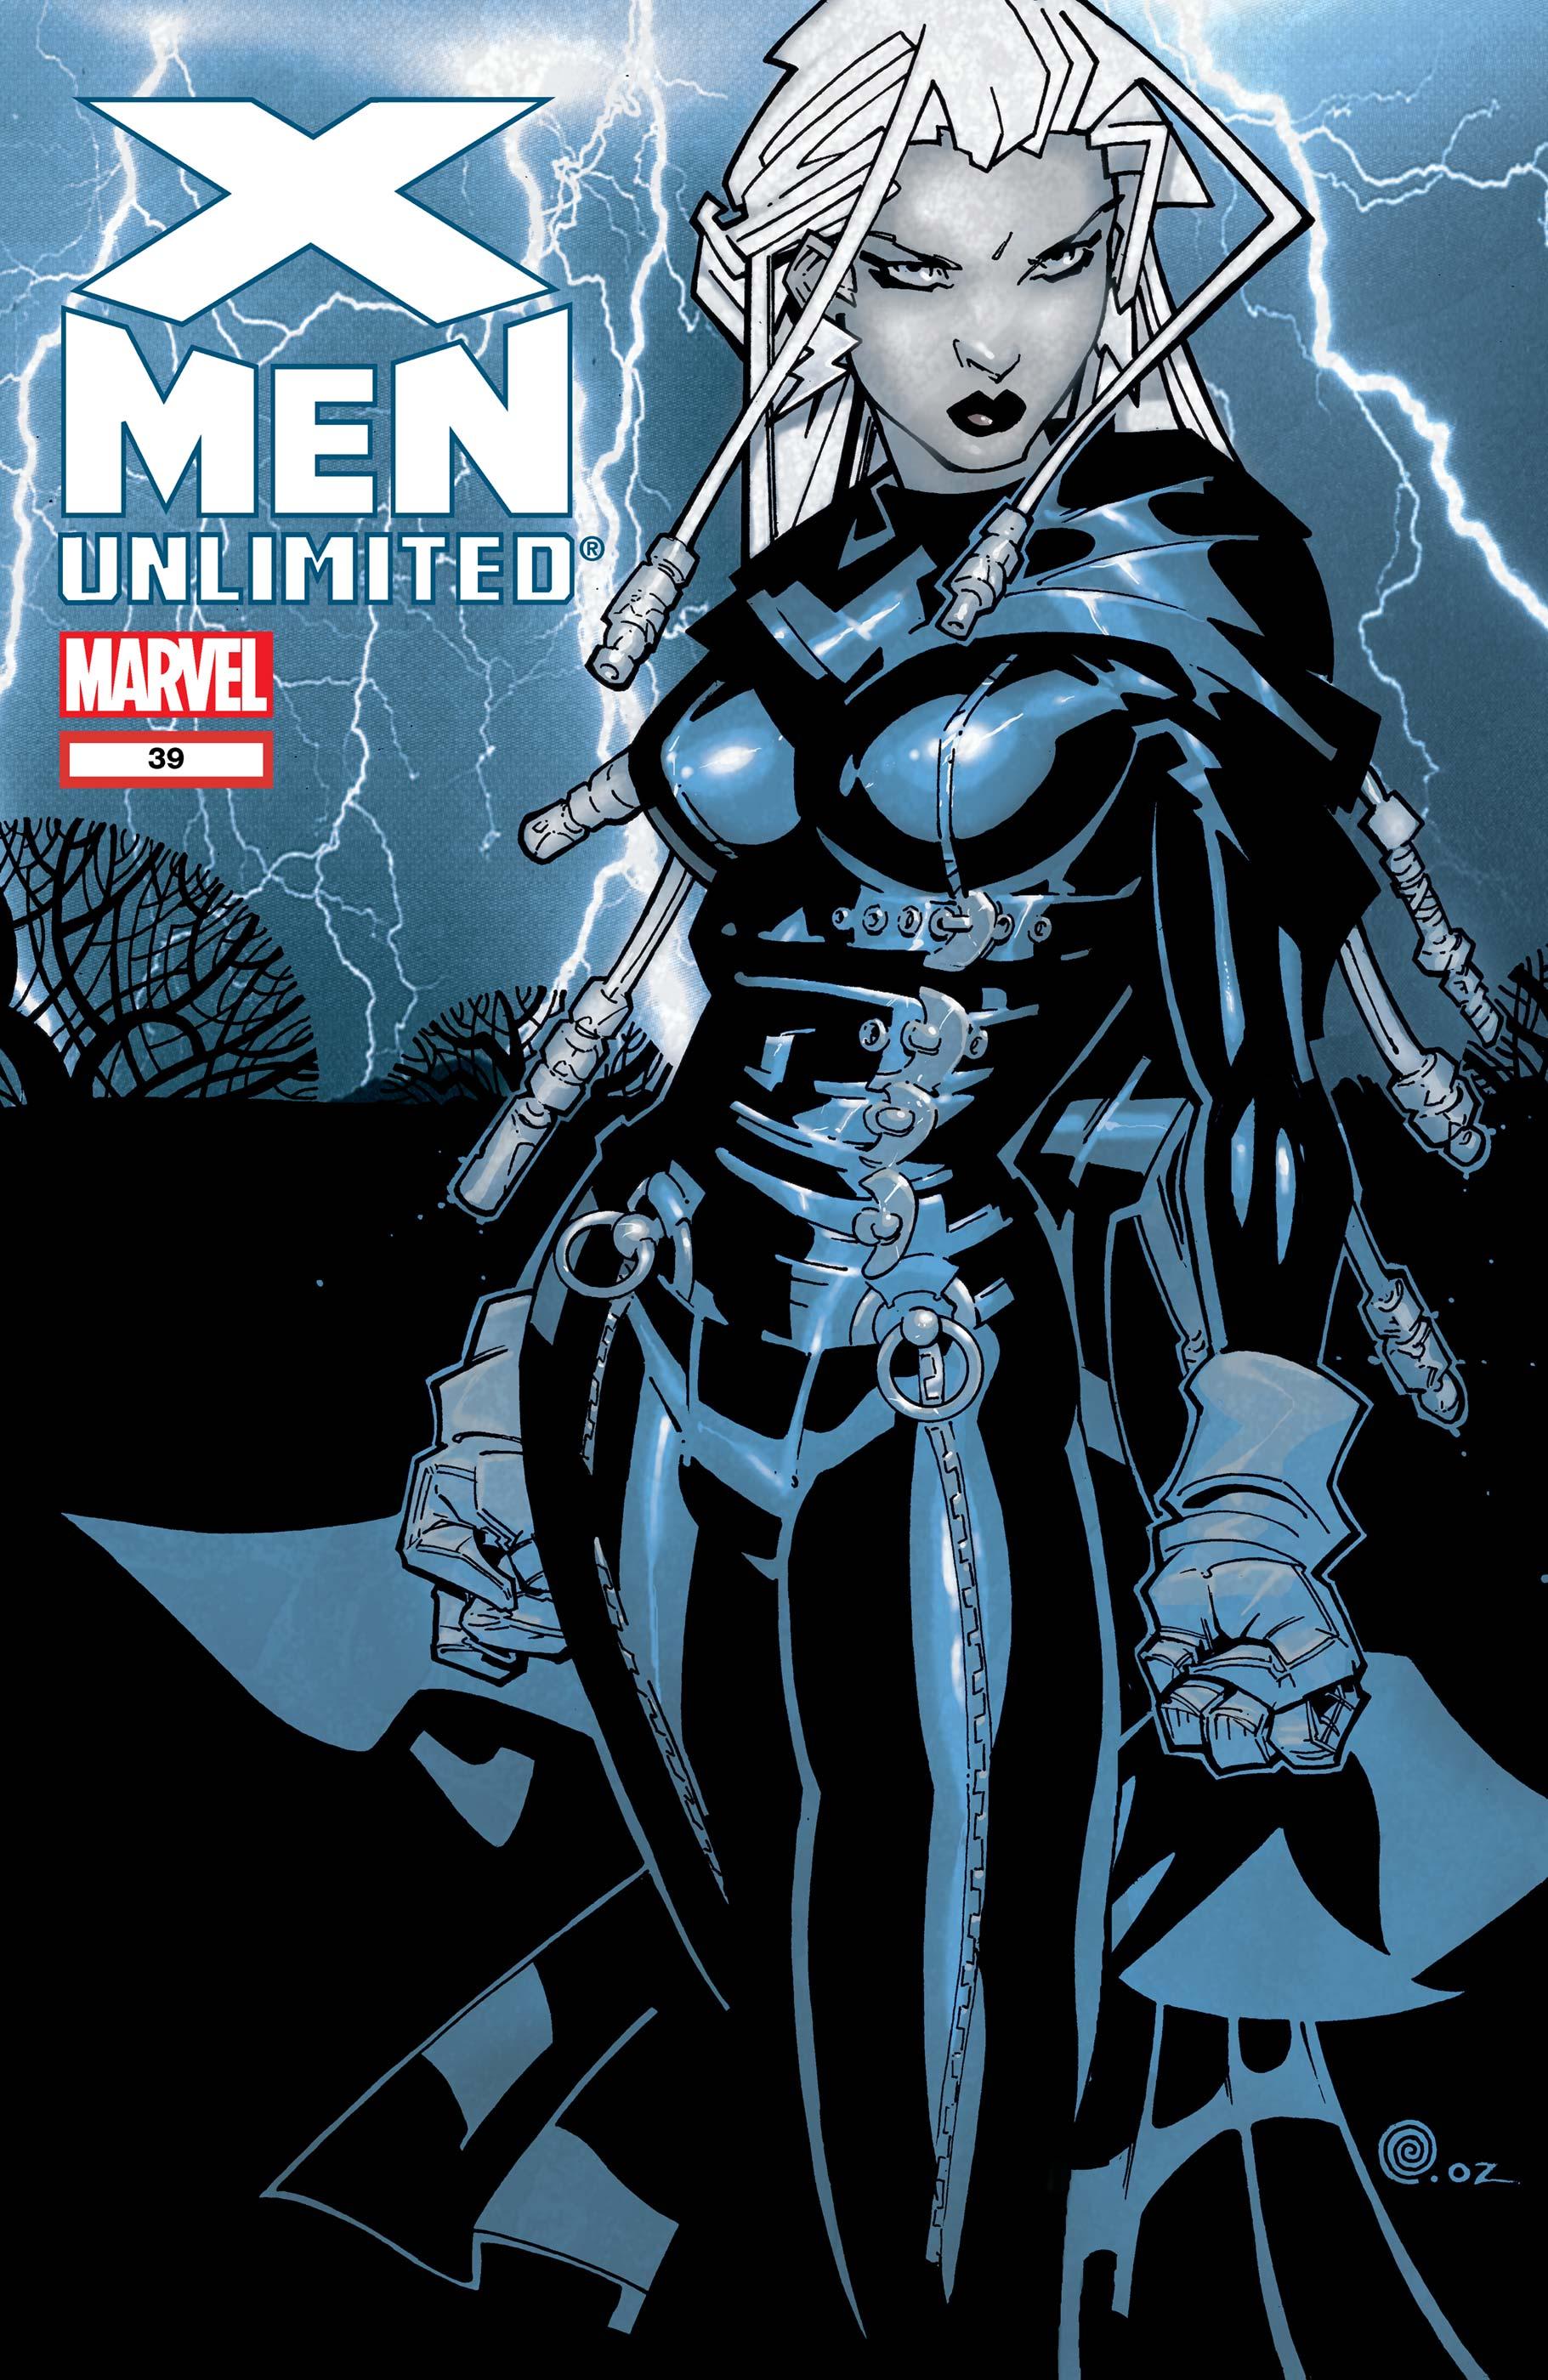 X-Men Unlimited (1993) #39